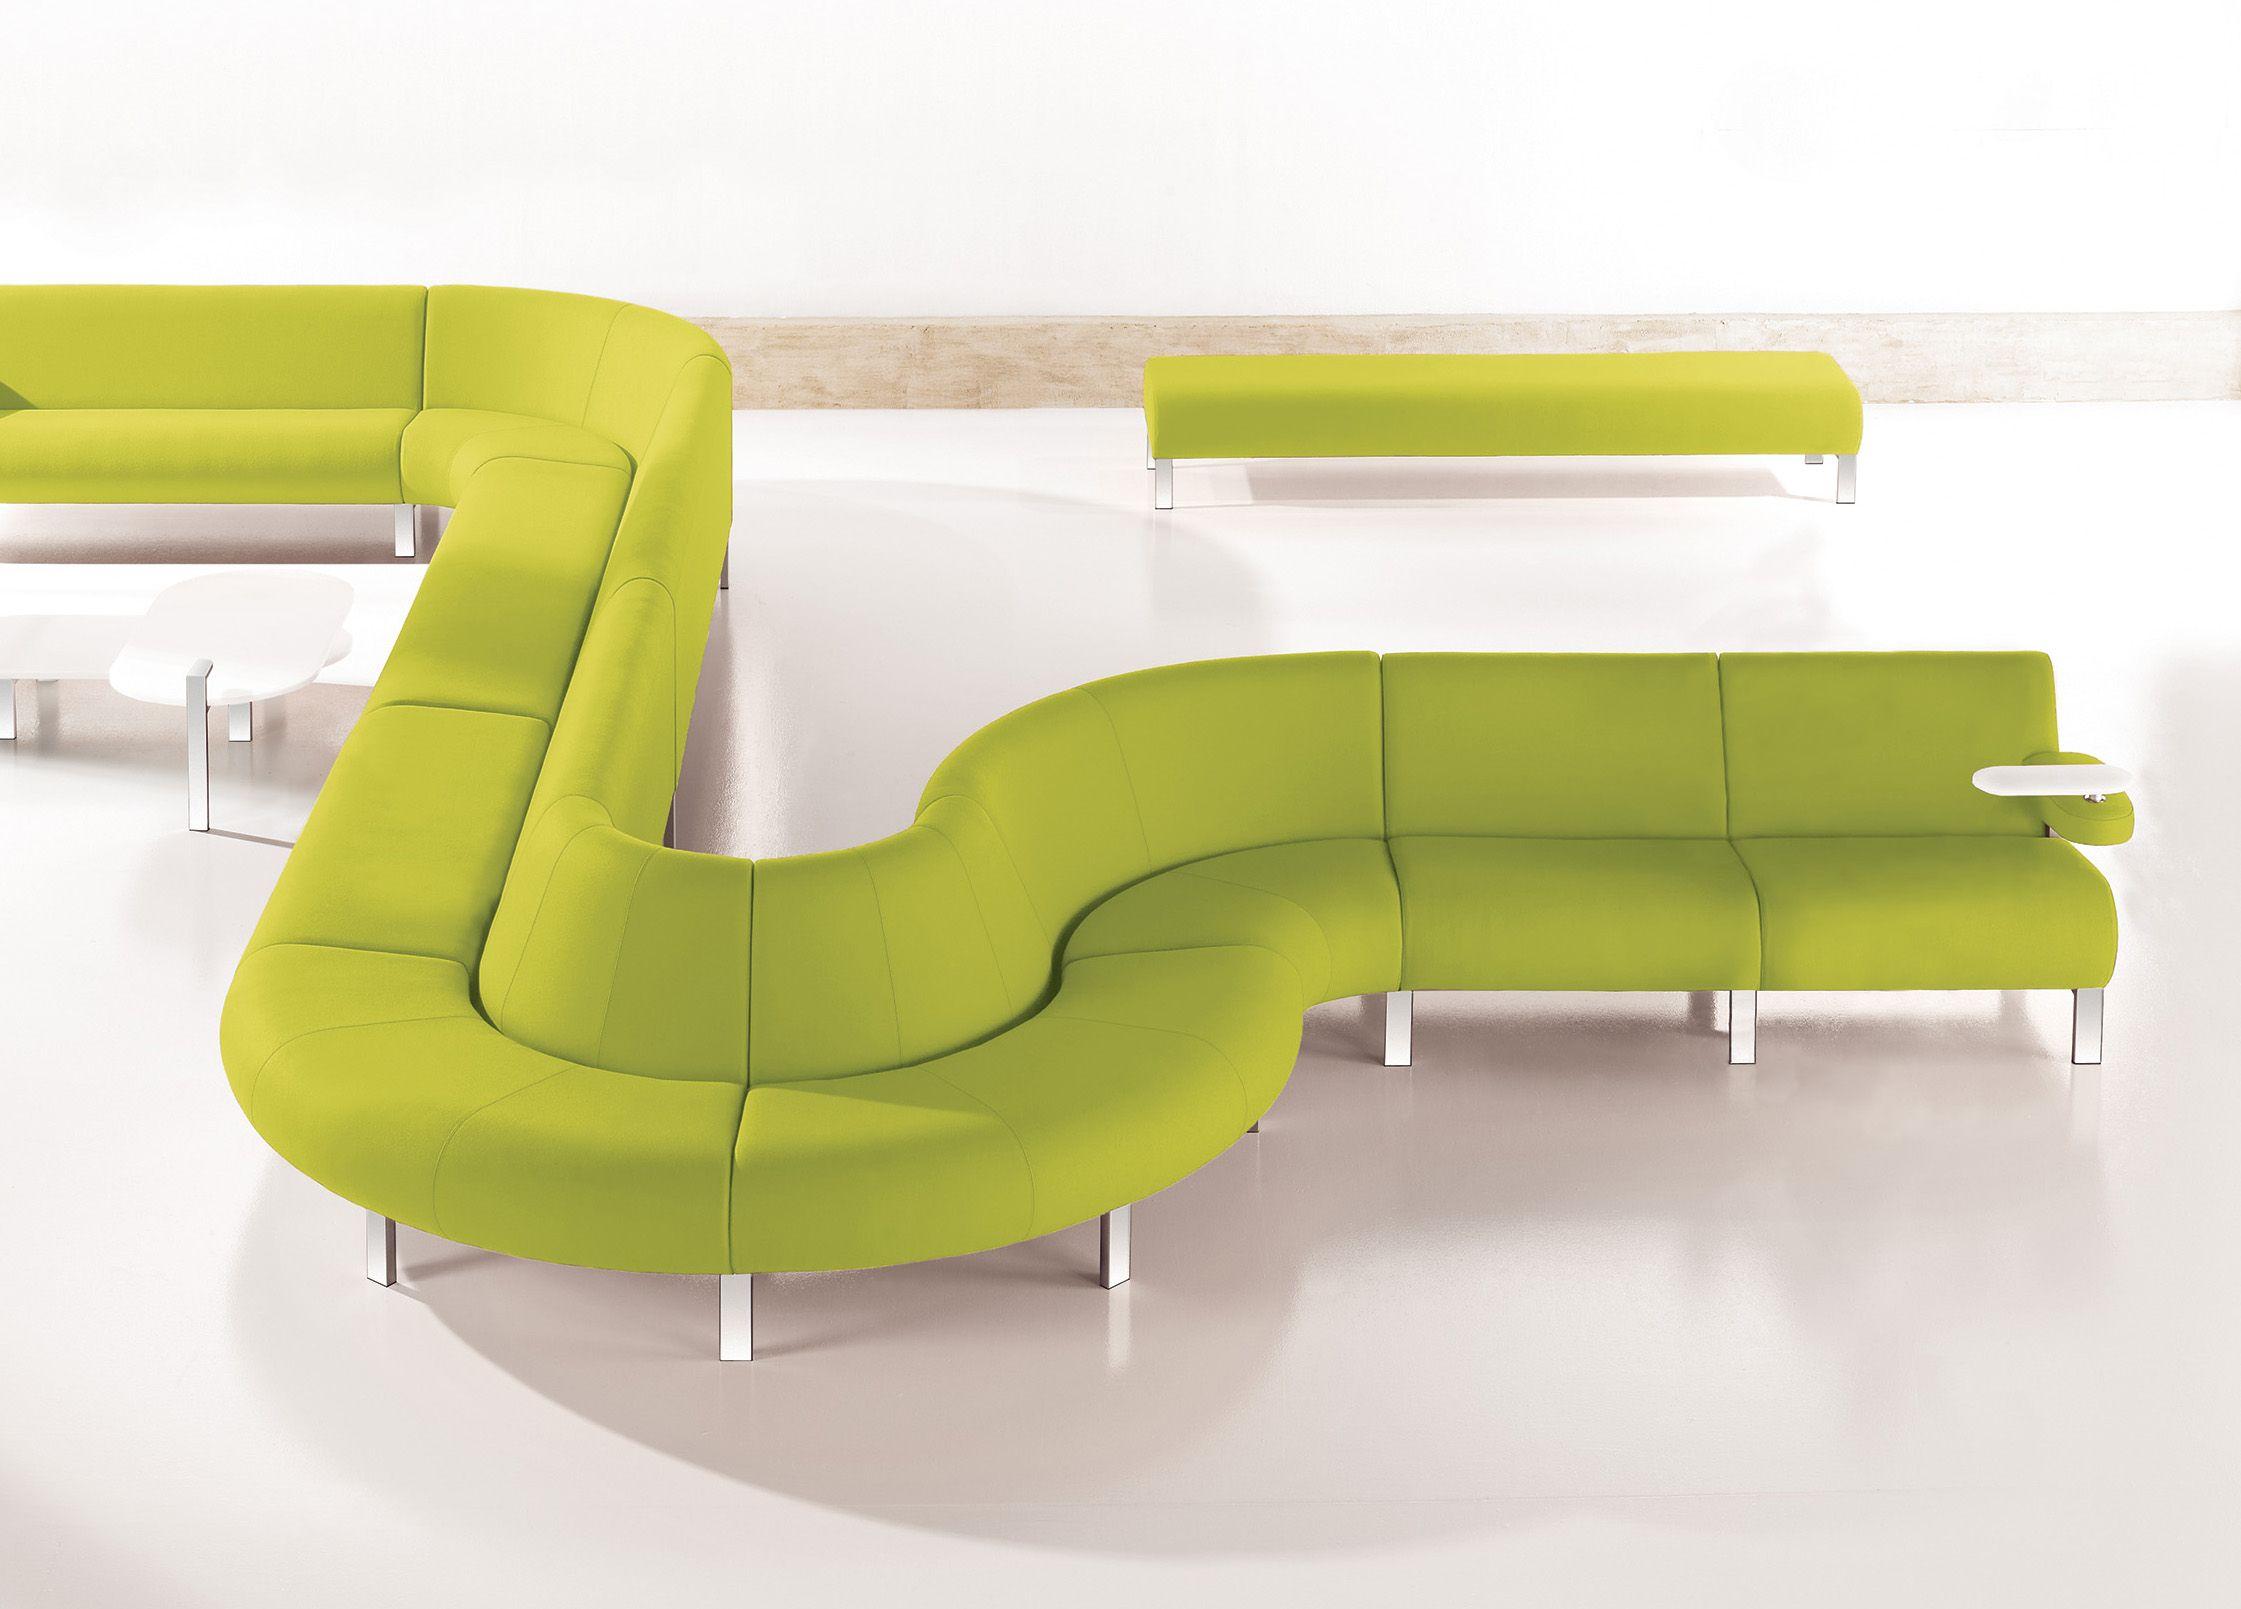 radius lounge from davis furniture | lounge | pinterest | office